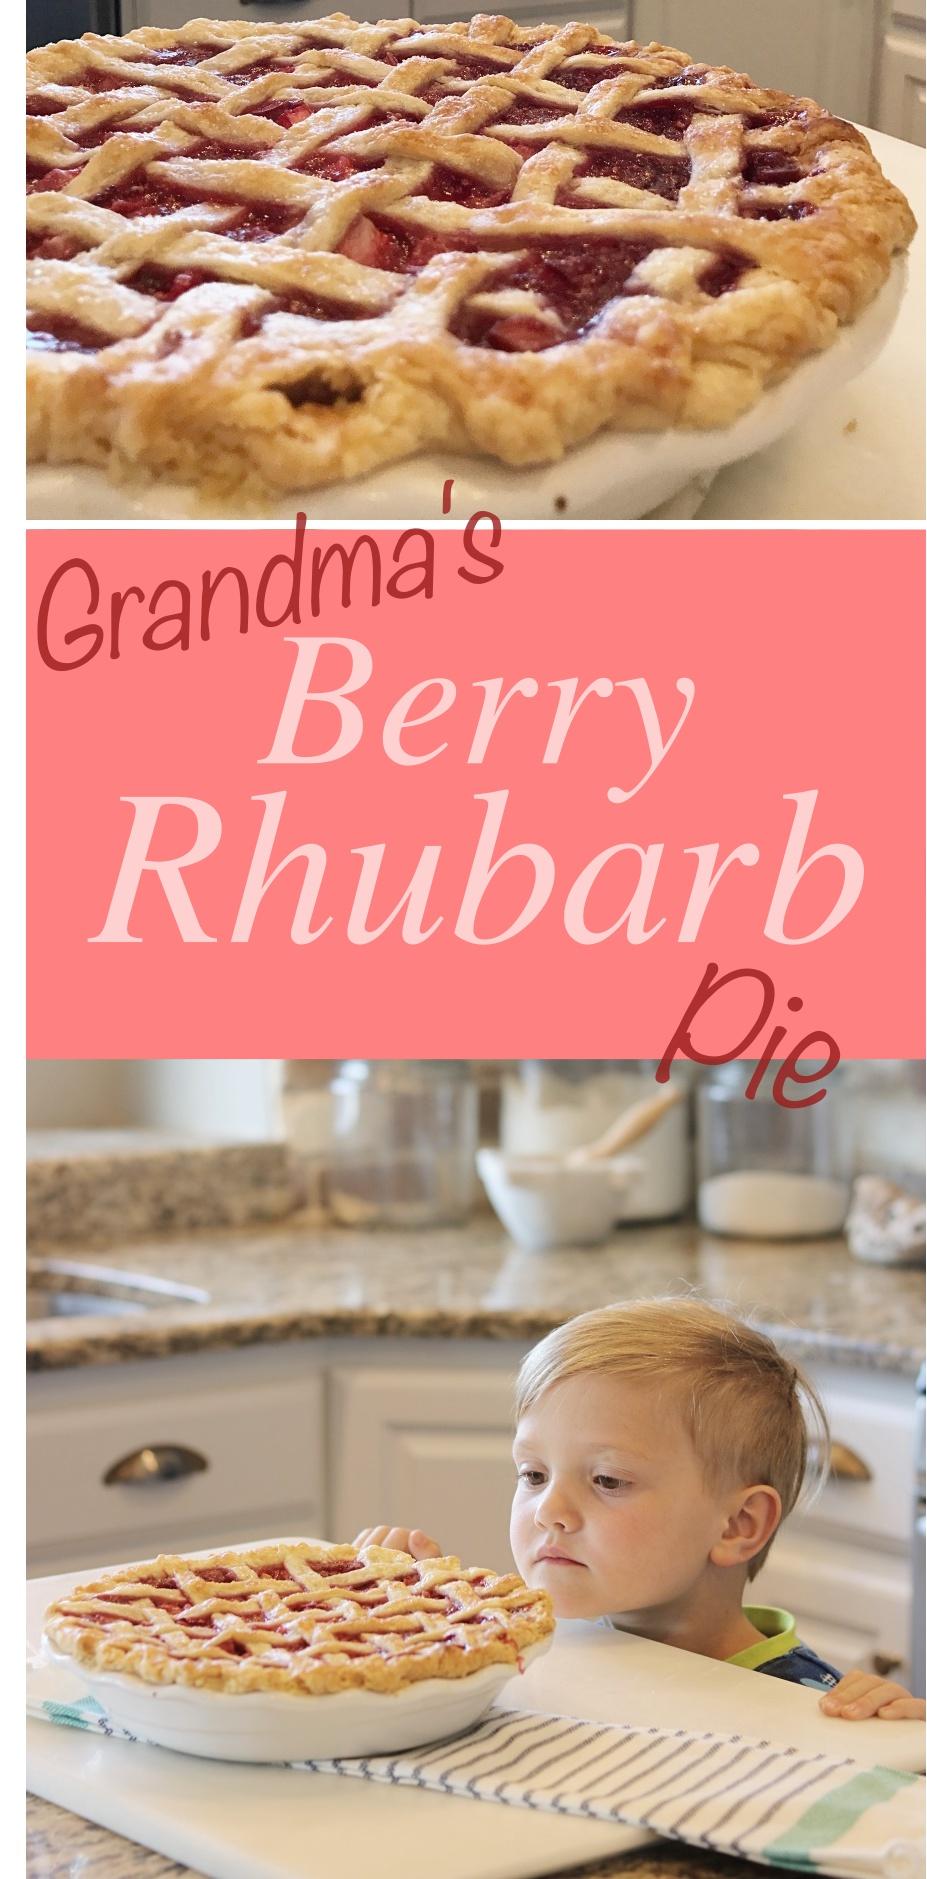 grandma's pie recipe, strawberry rhubarb pie, berry pie